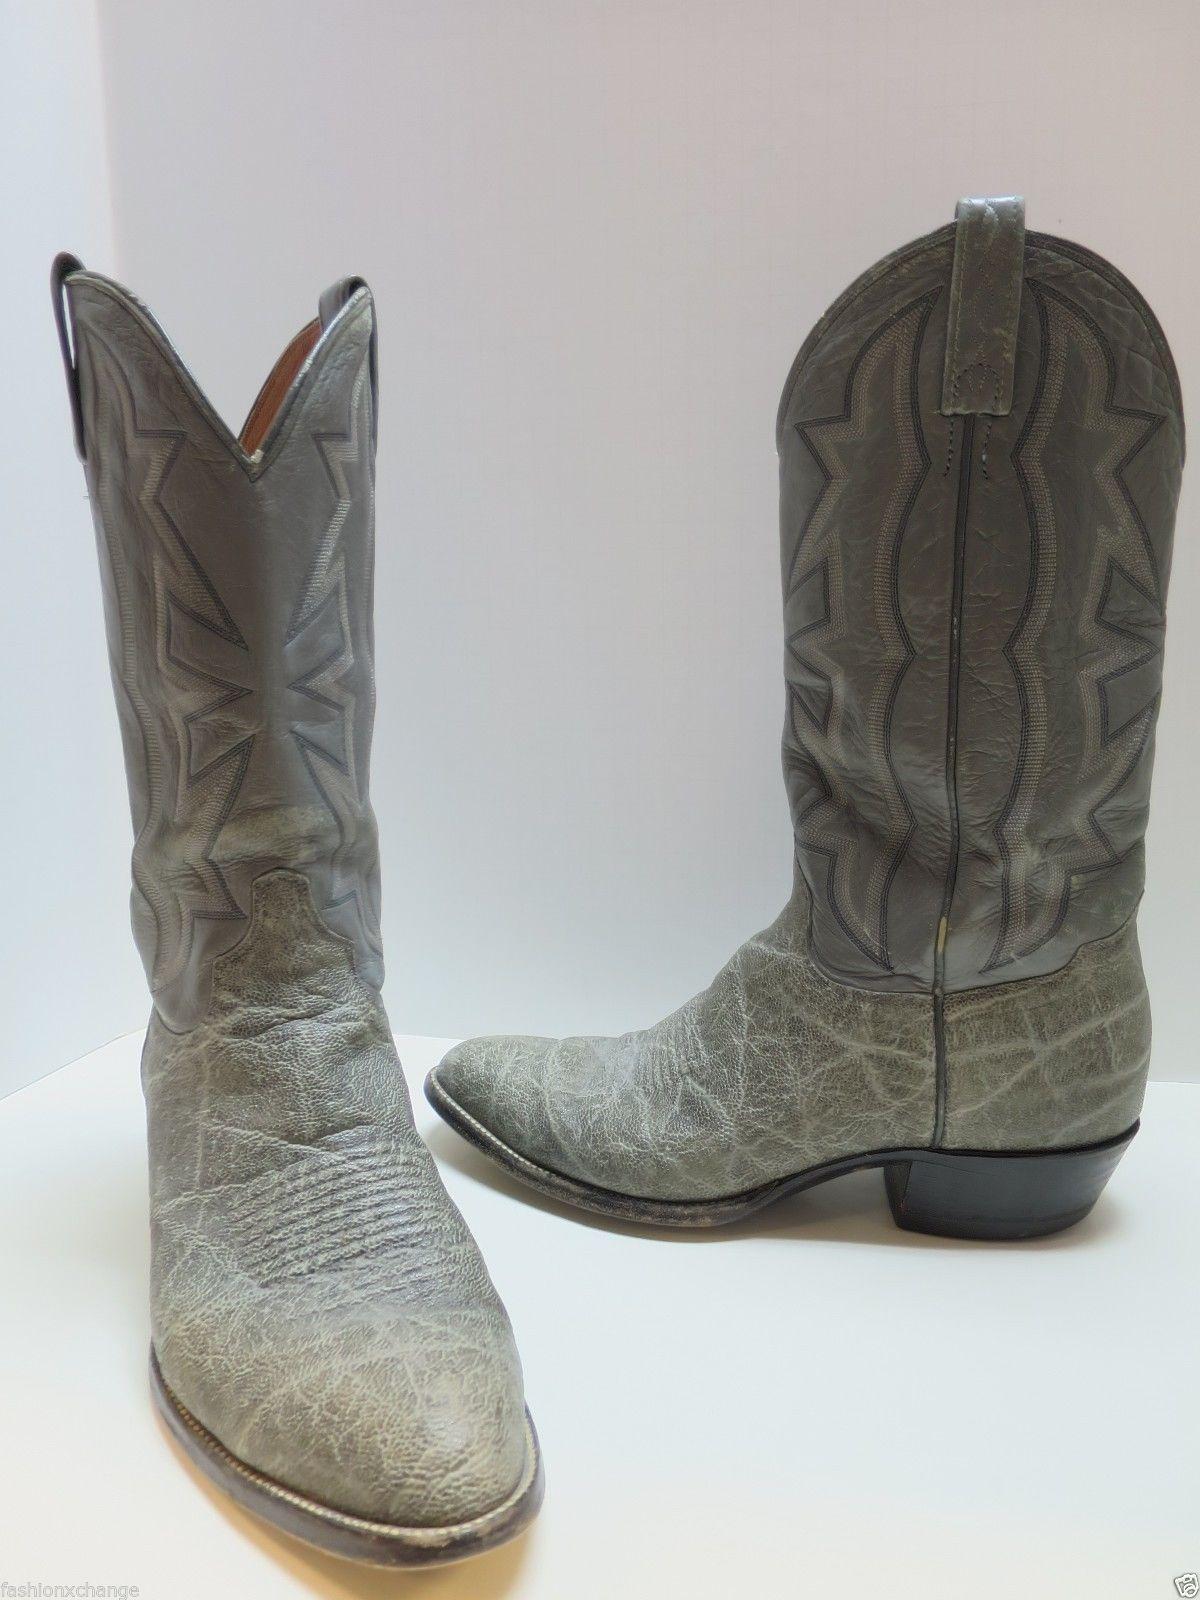 d51c2f17986 EL DORADO Grey Elephant Skin Men's Cowboy Boots Size 10 Price ...